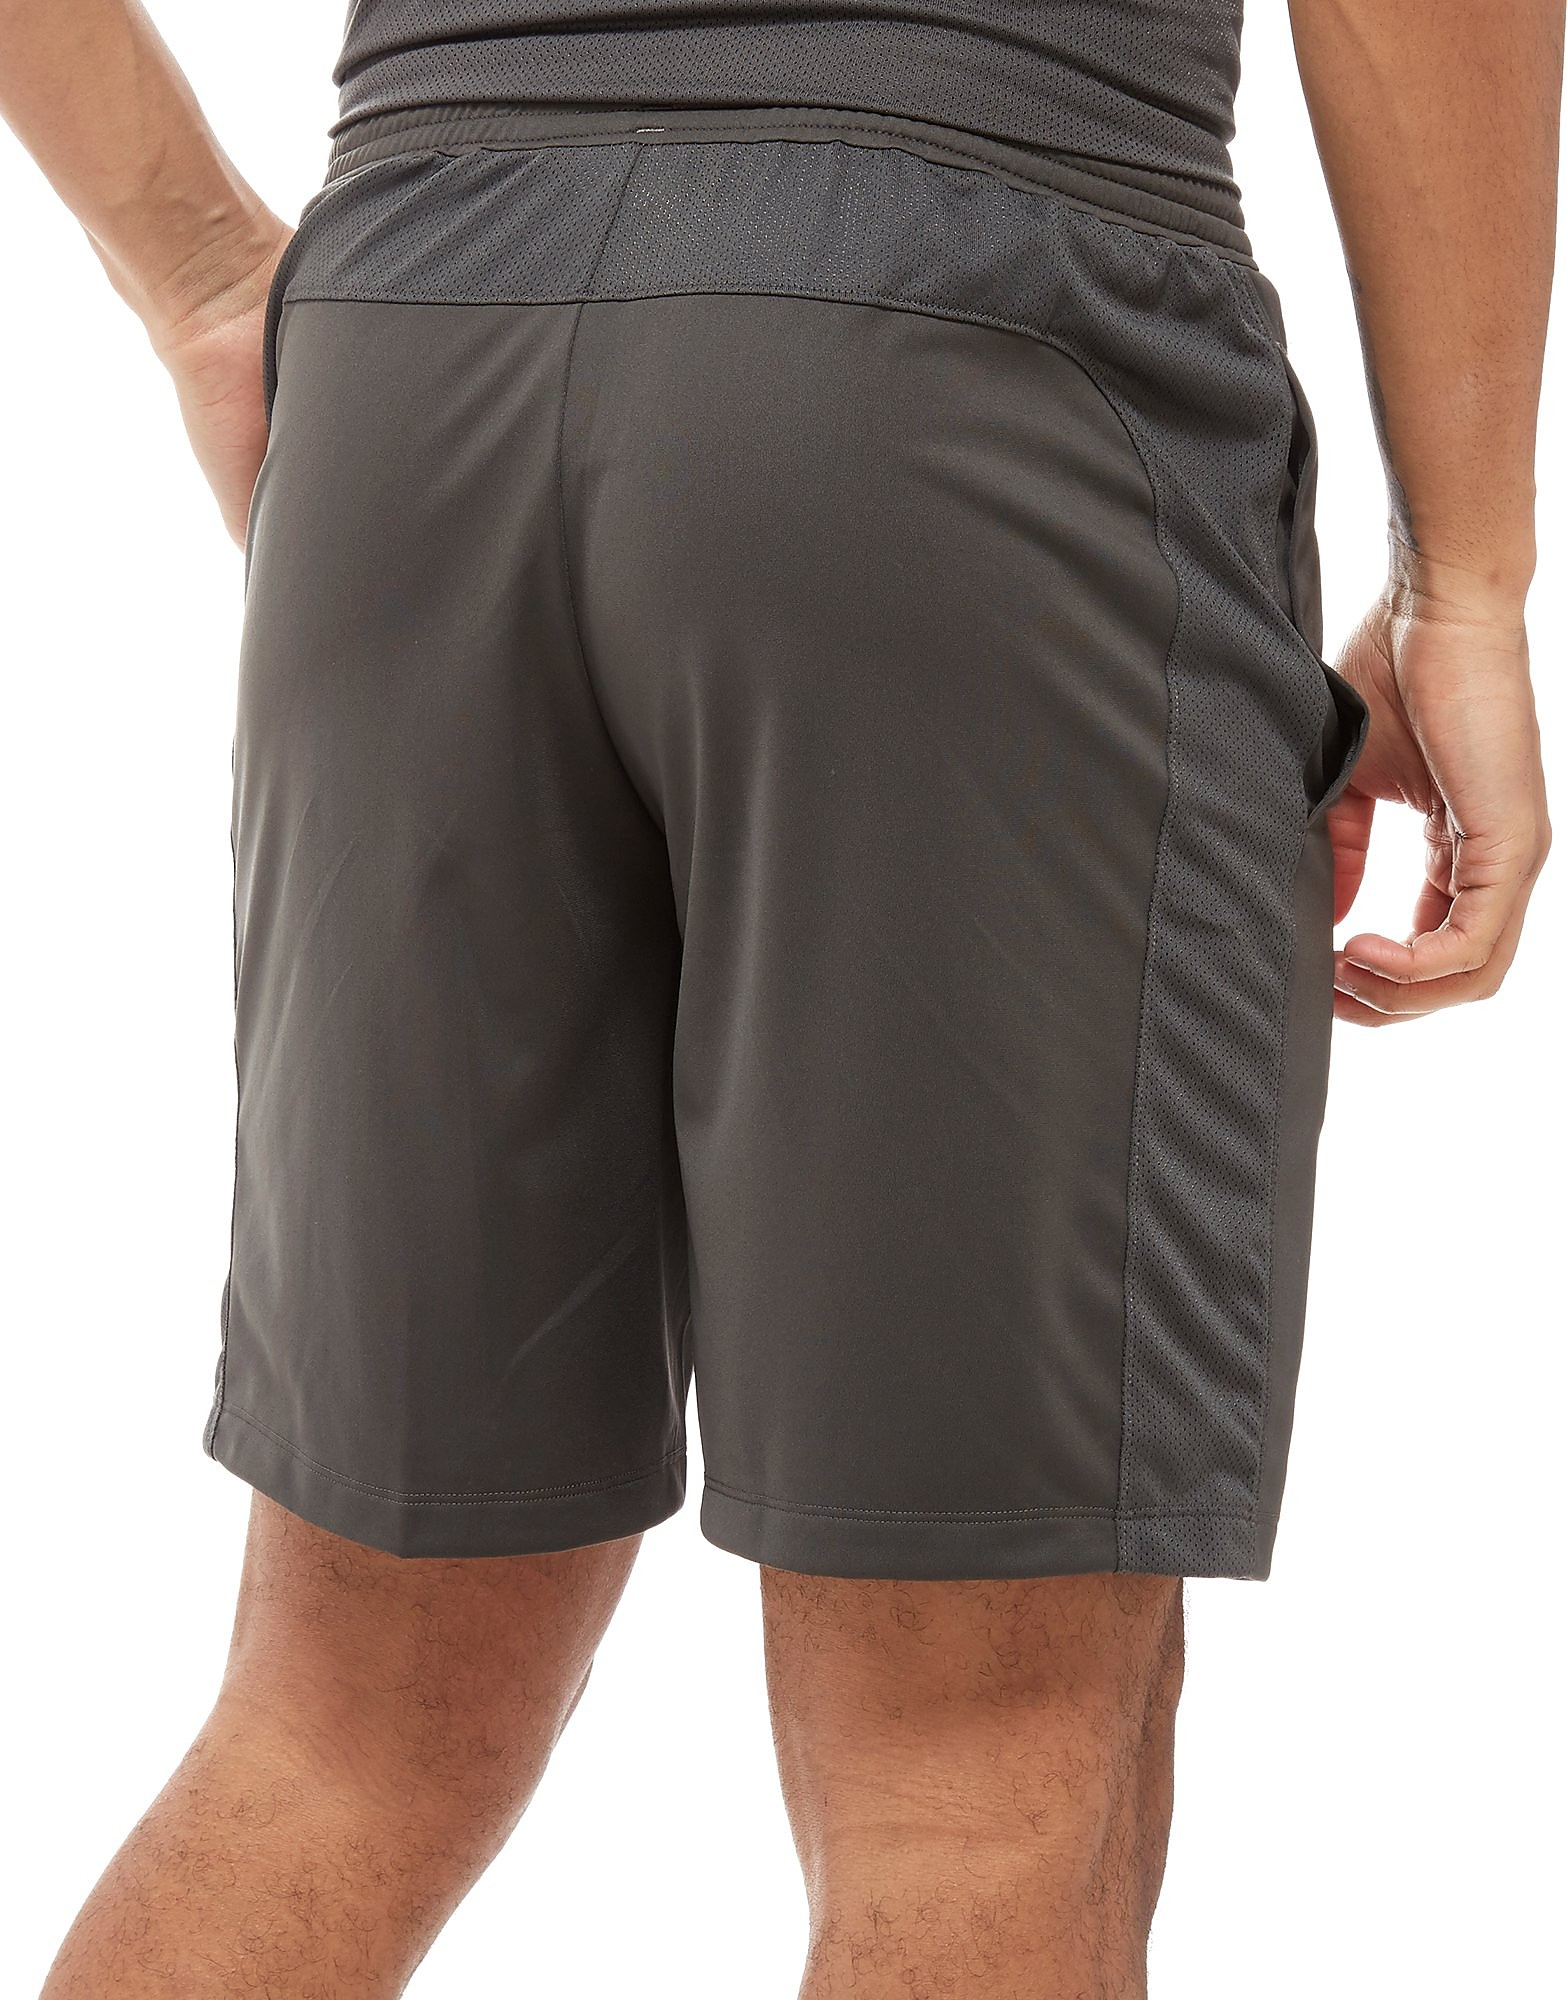 "Under Armour Raid 2.0 8"" Shorts"